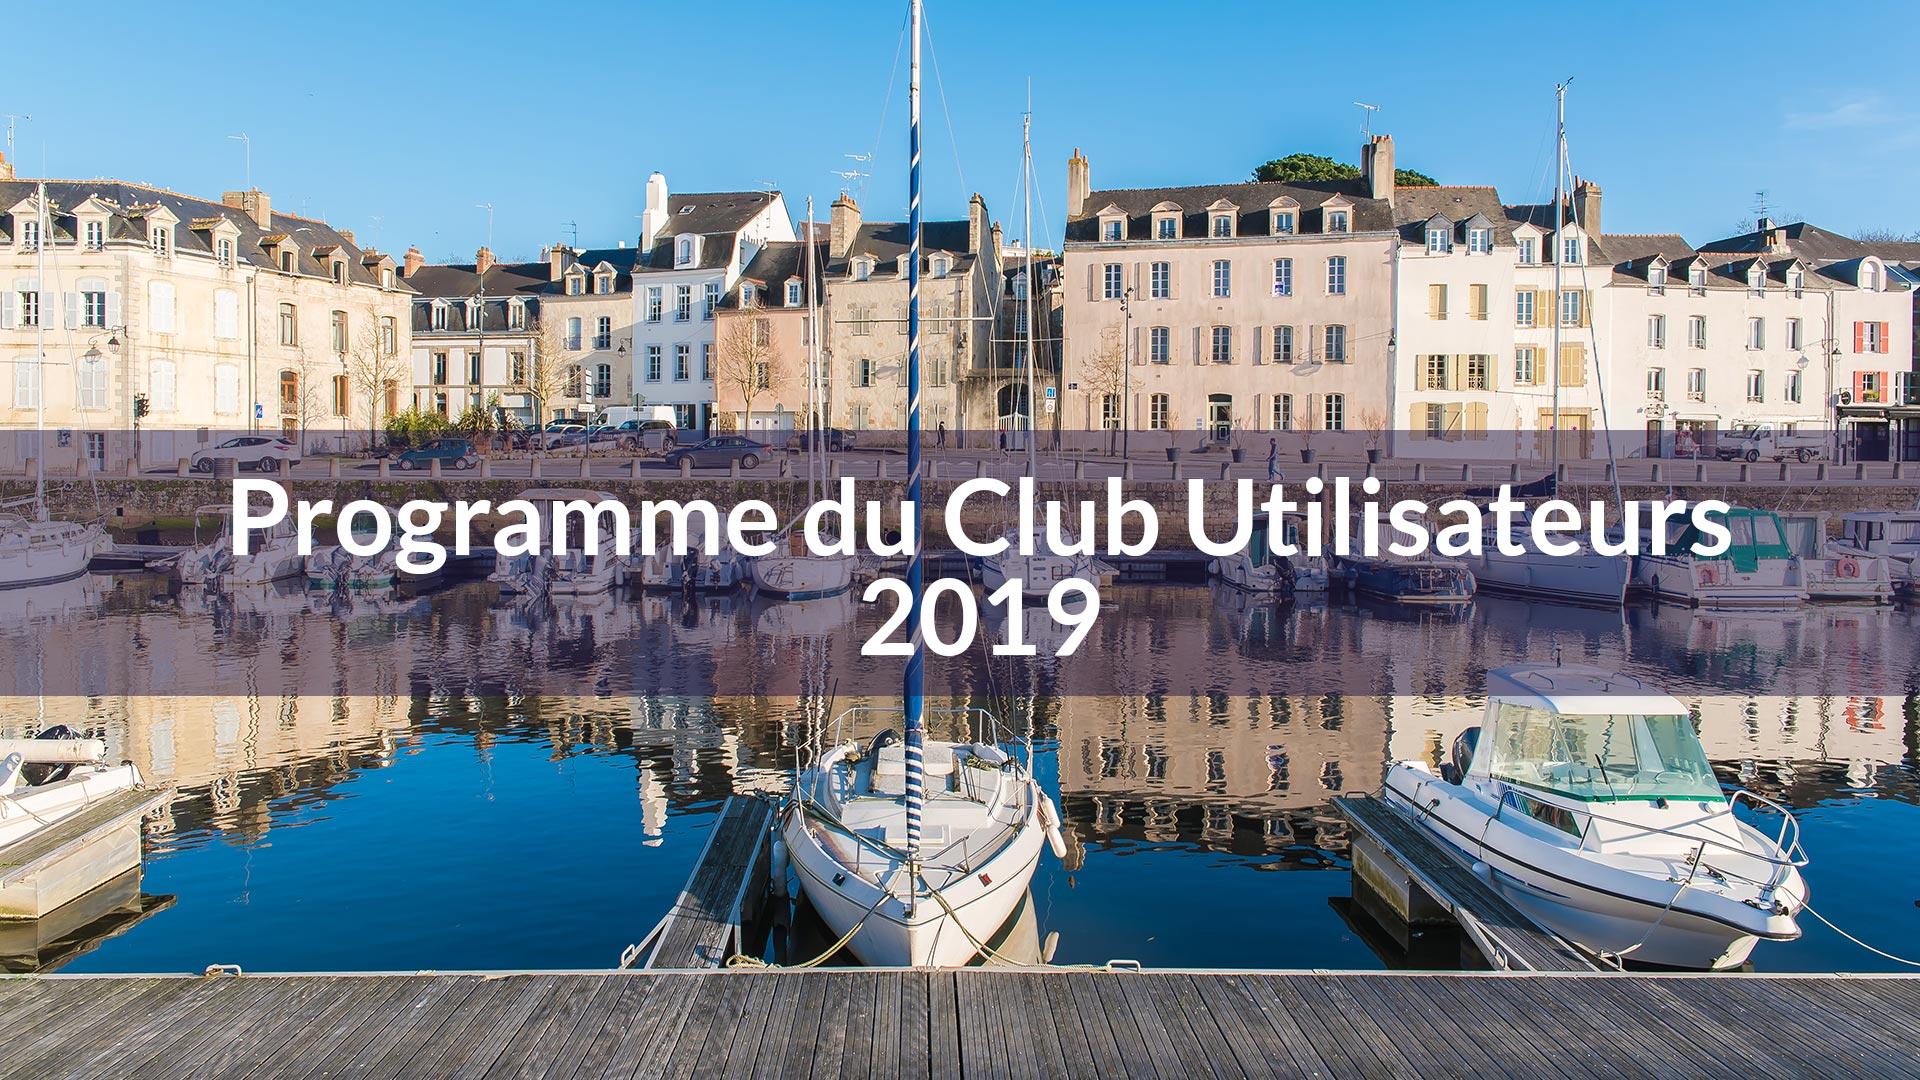 programme-club-u-2019-MGDIS-1920×1080-3